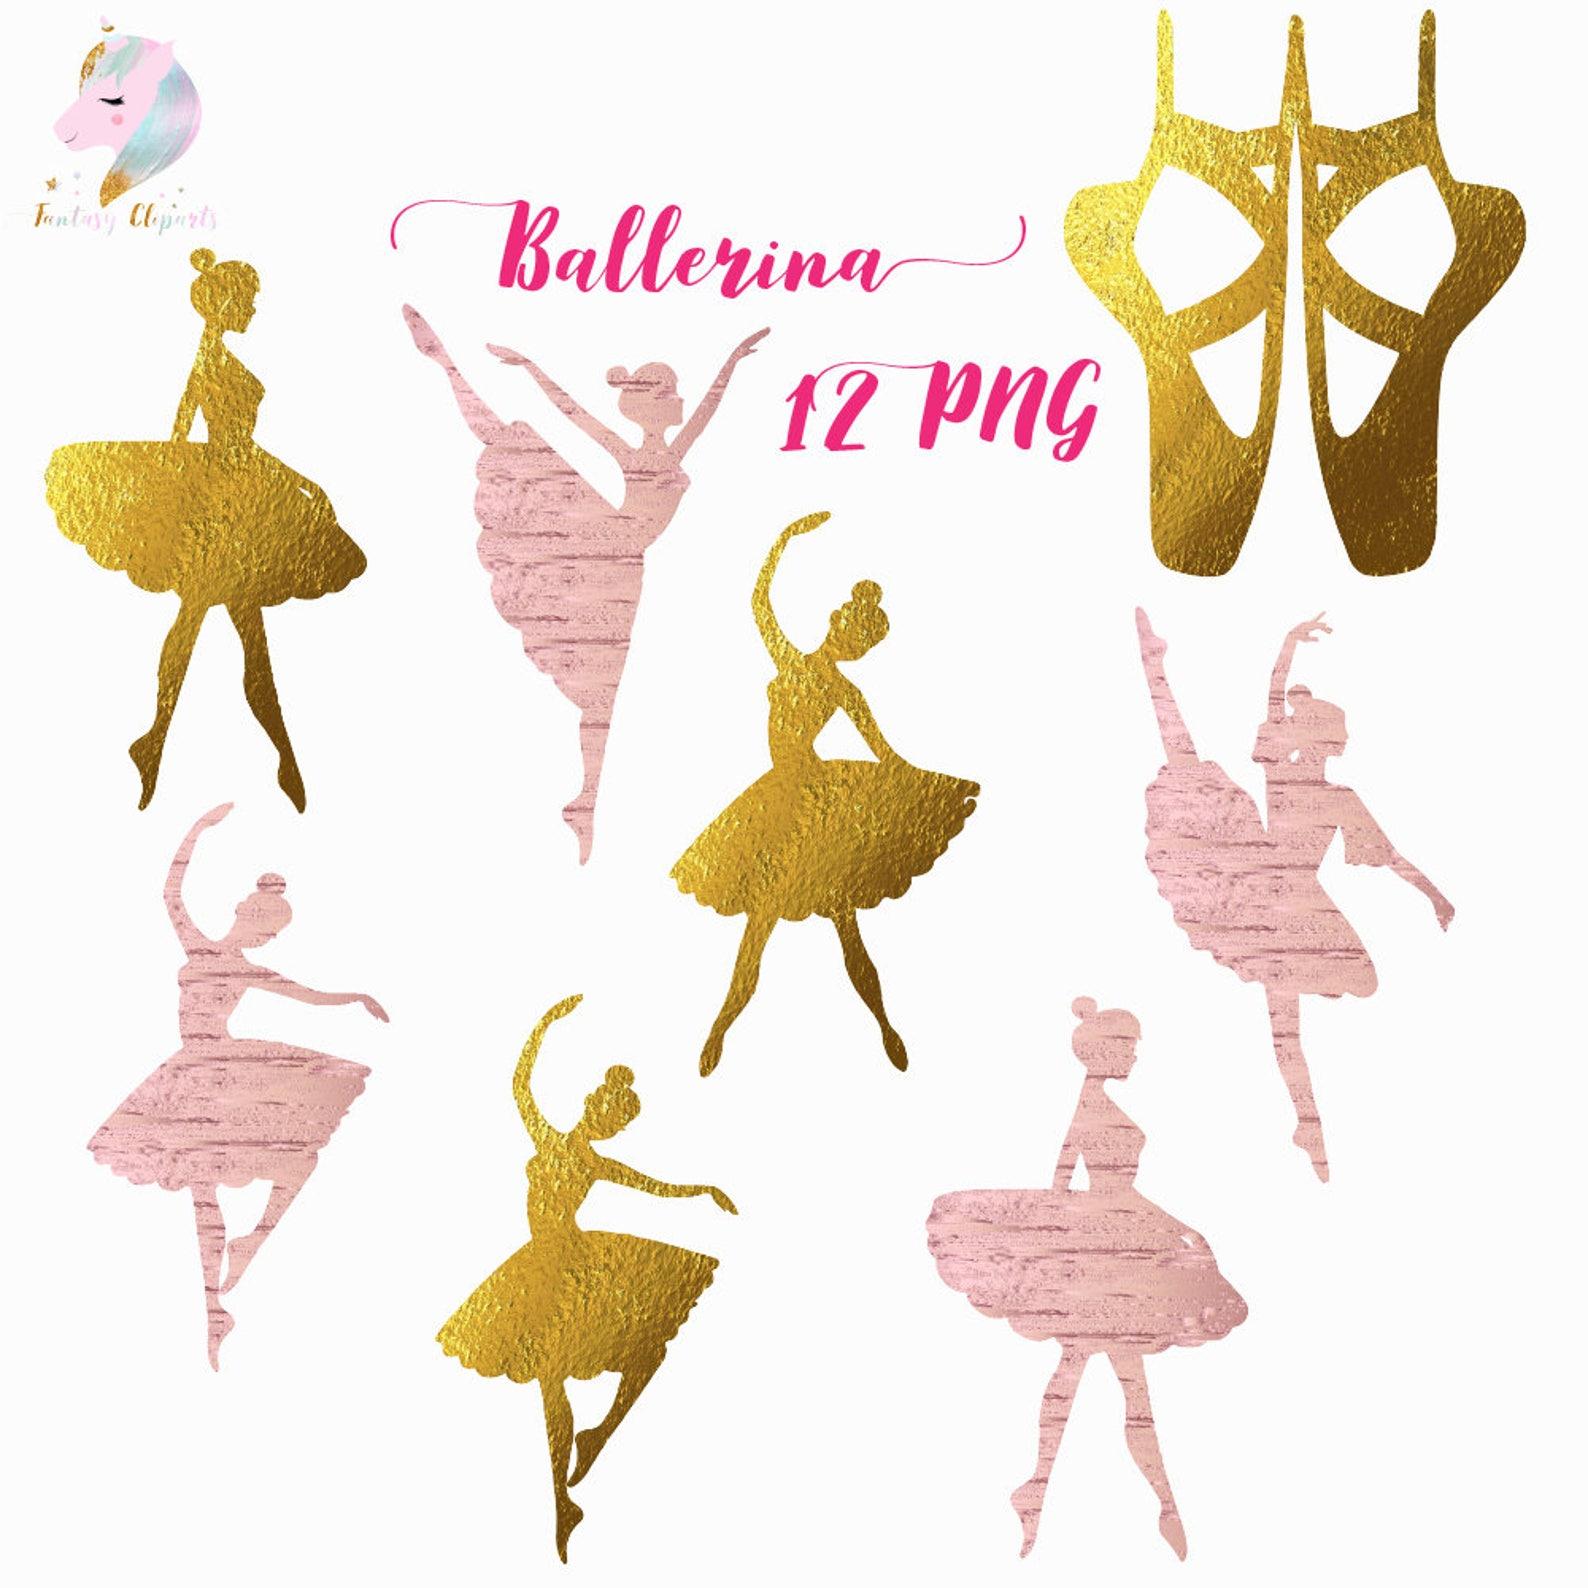 ballerina silhouette, ballerina clipart, ballet clip art, gold foil graphics, rose gold ballerina, silhouettes clipart, dancing